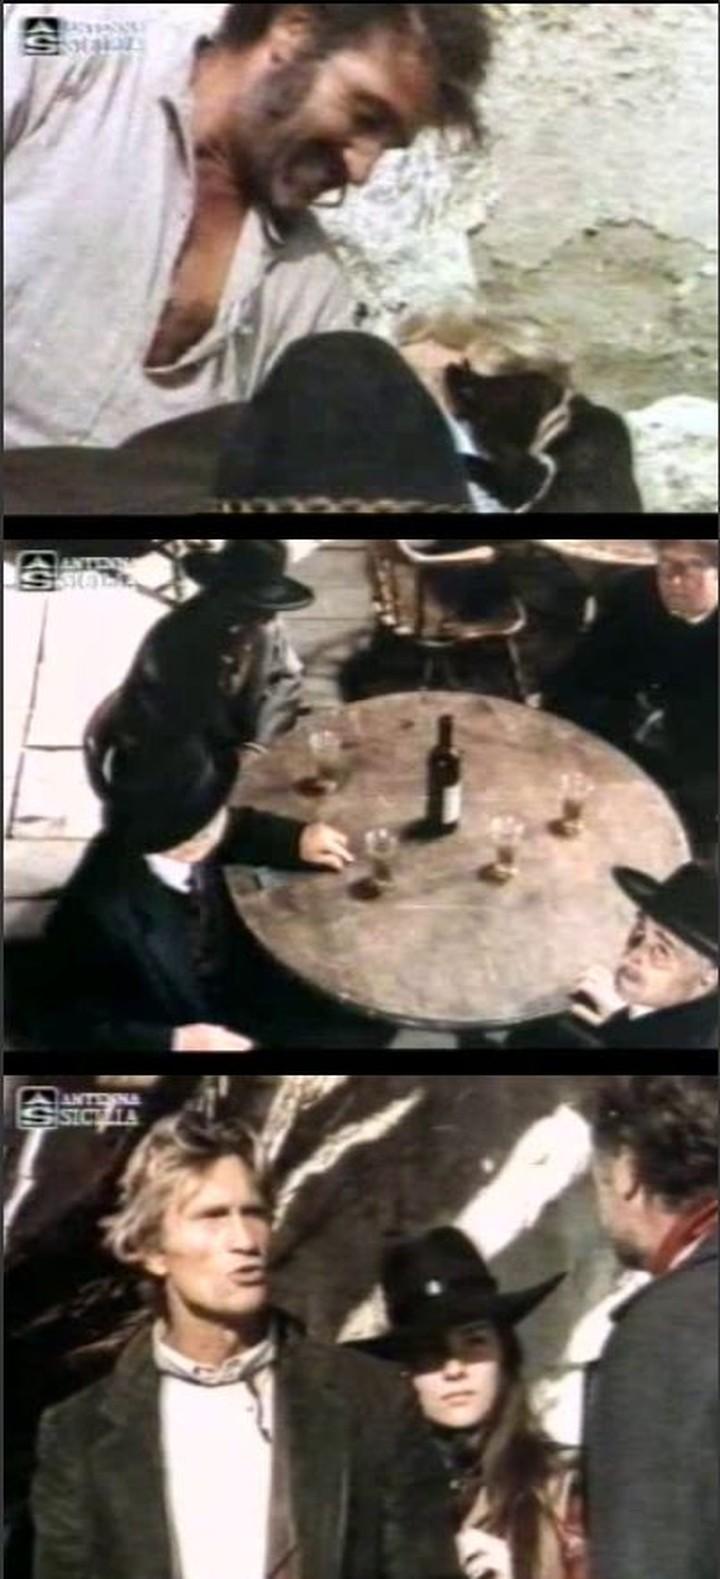 I sette del gruppo selvaggio (Inédit en France) - 1972 ou 1975 - Gianni Crea - Captur18